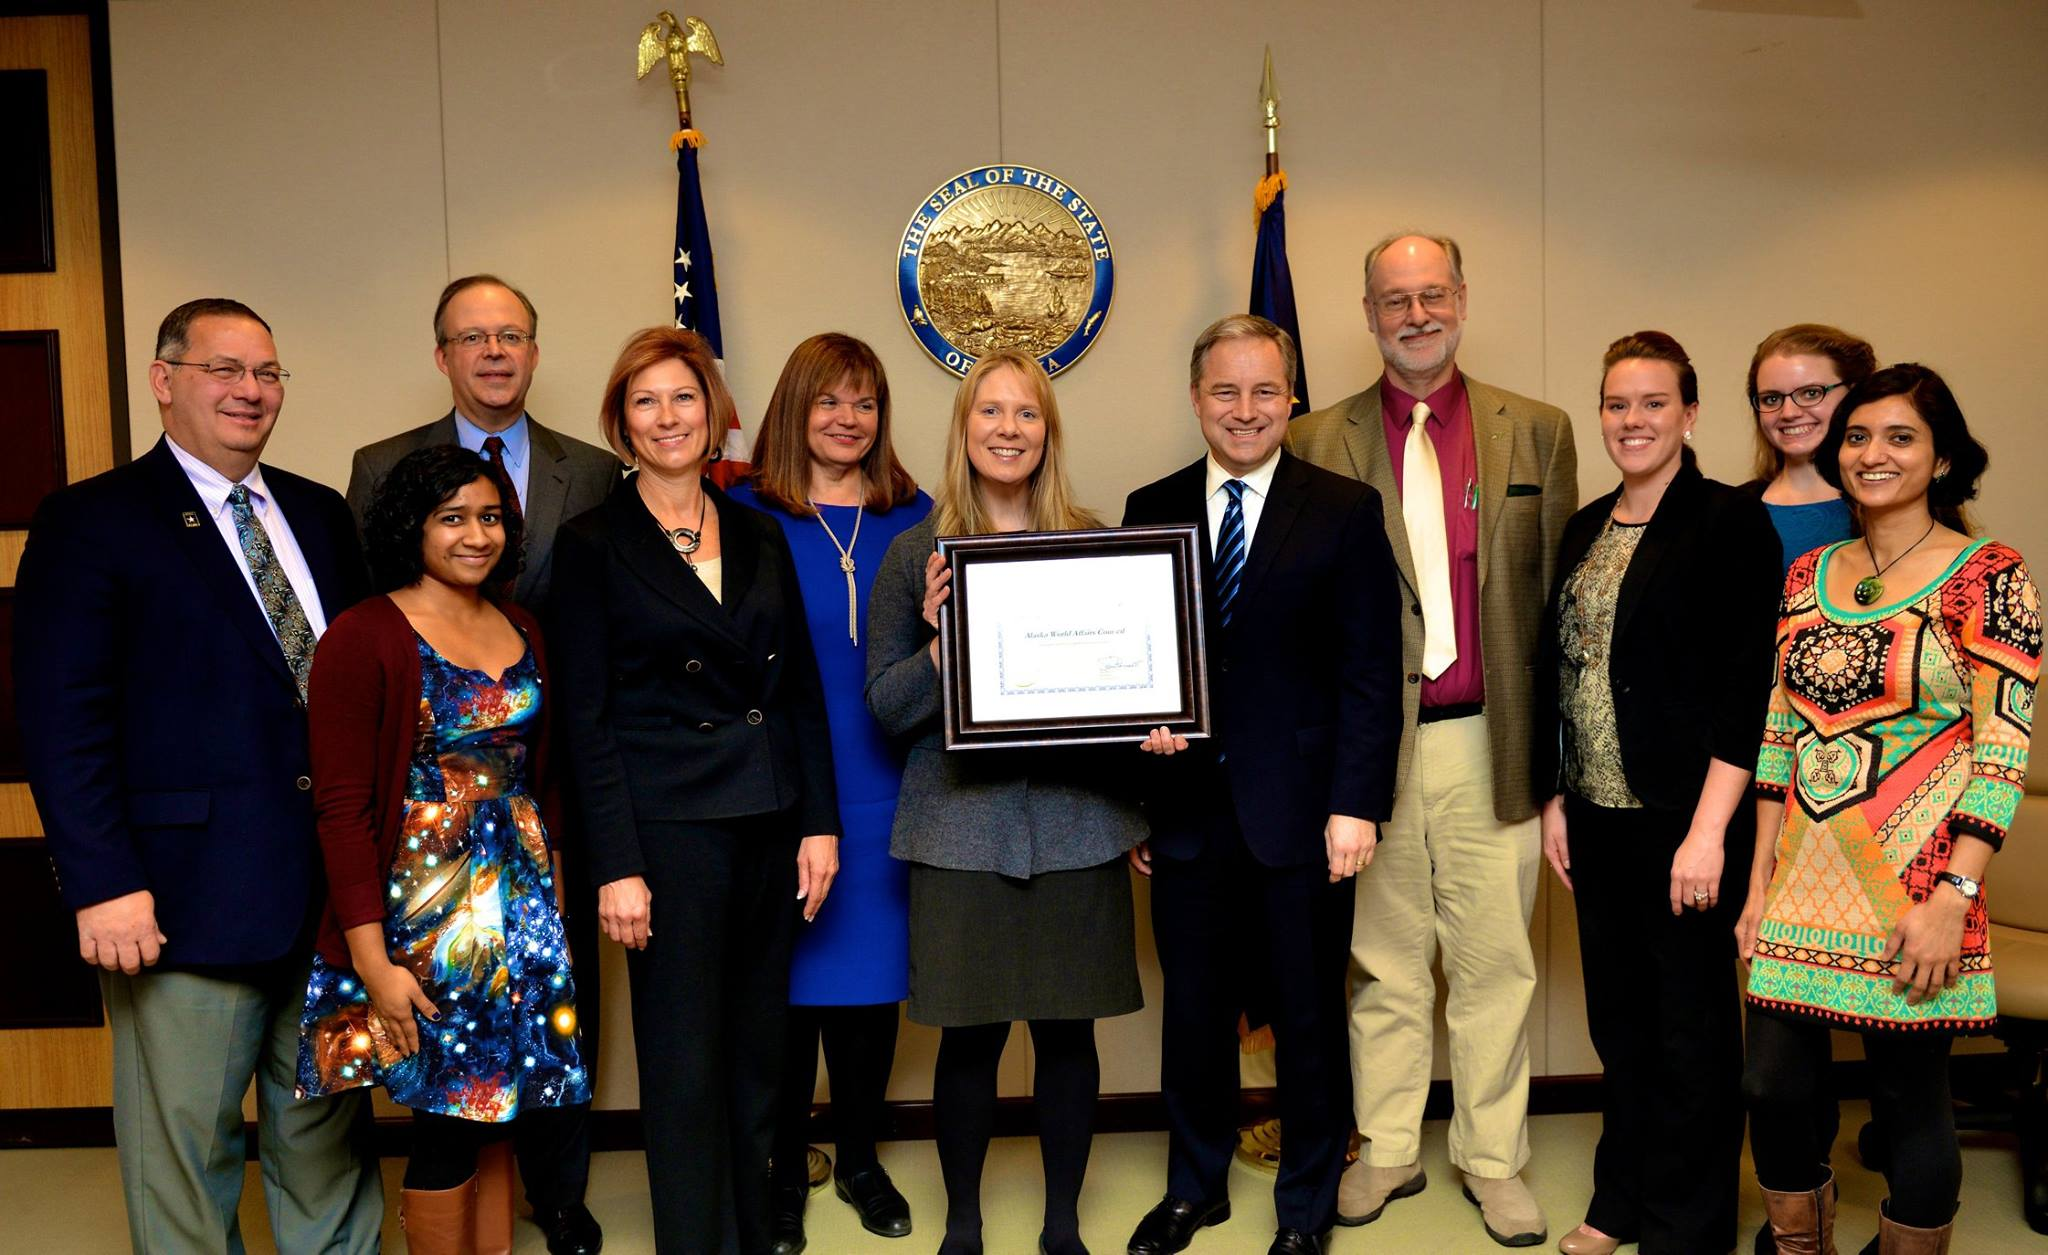 Governor's North Star Award